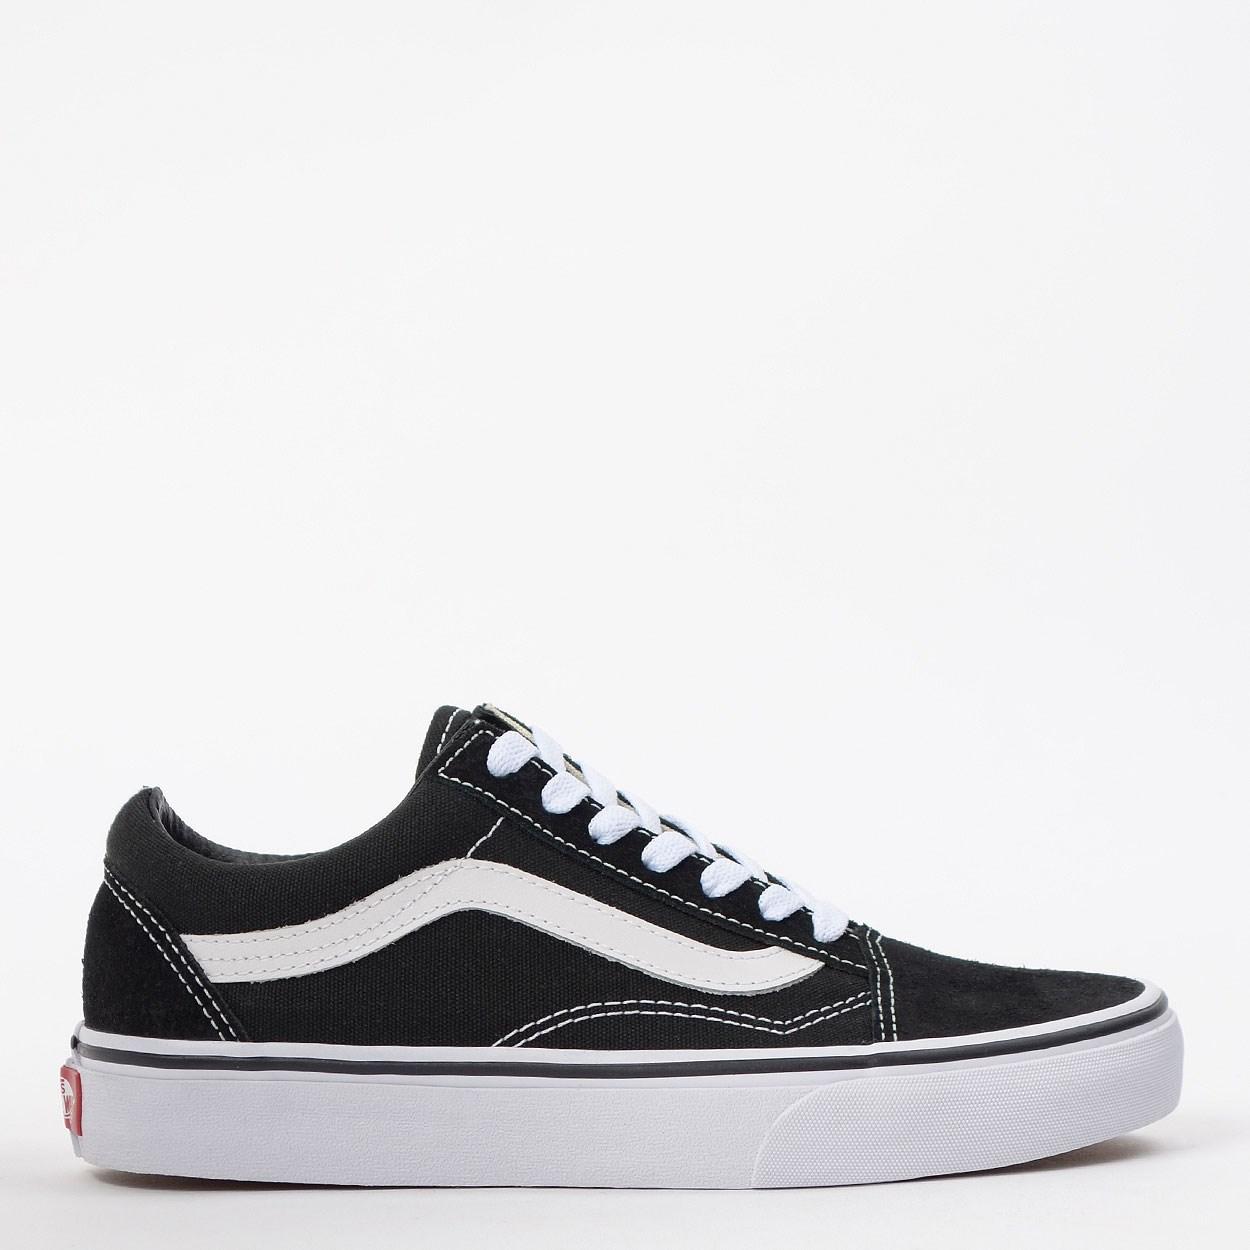 Vans Old Skool Black White VN000D3HY28